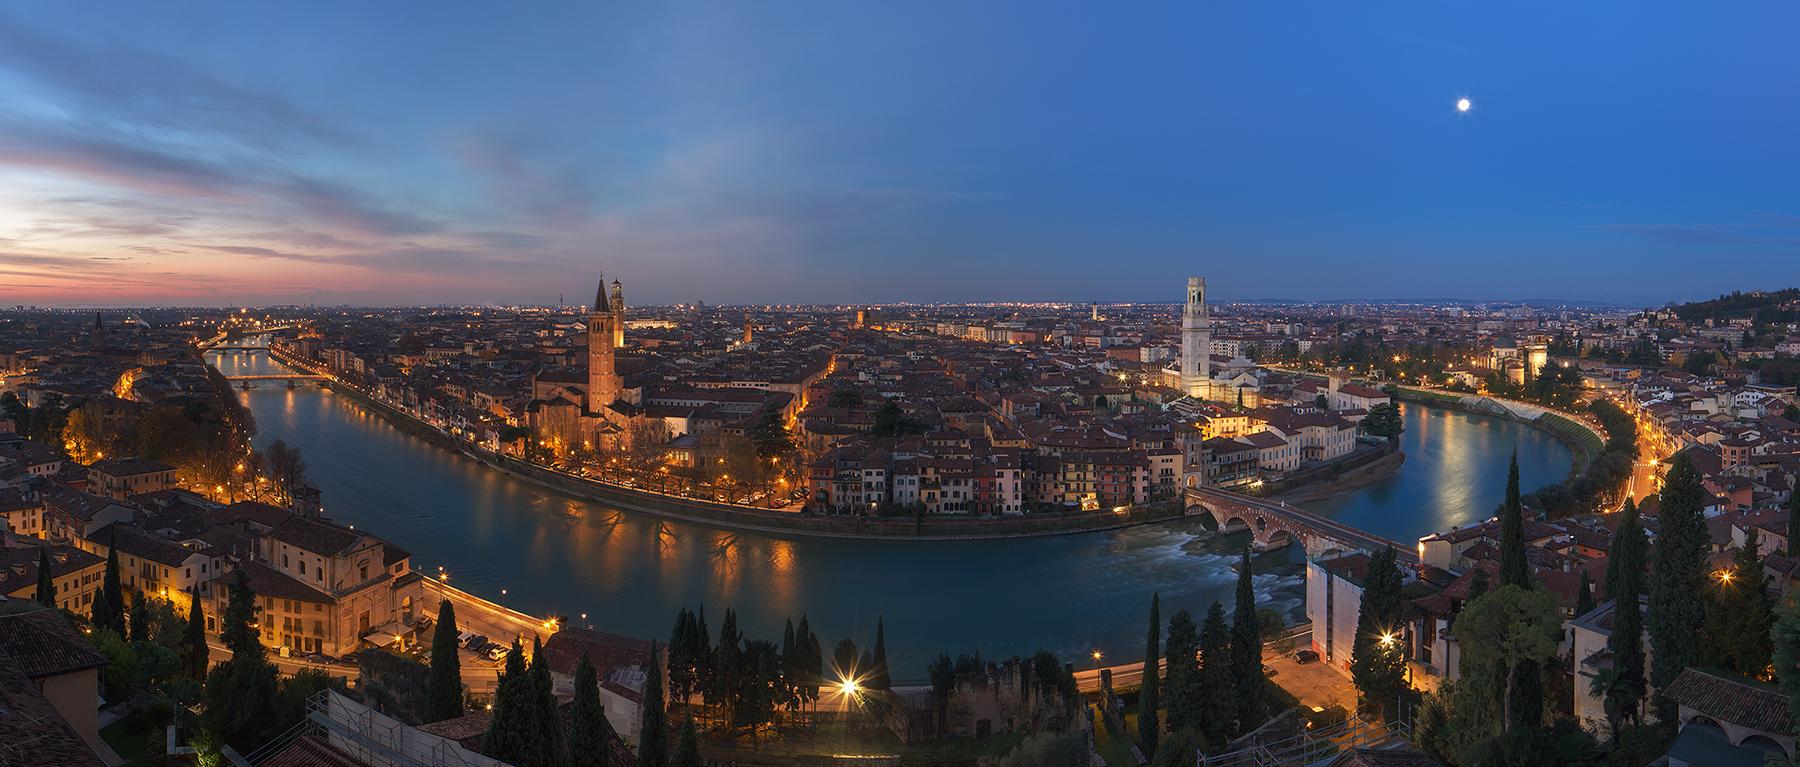 Verona, between sleep and wakefulness...